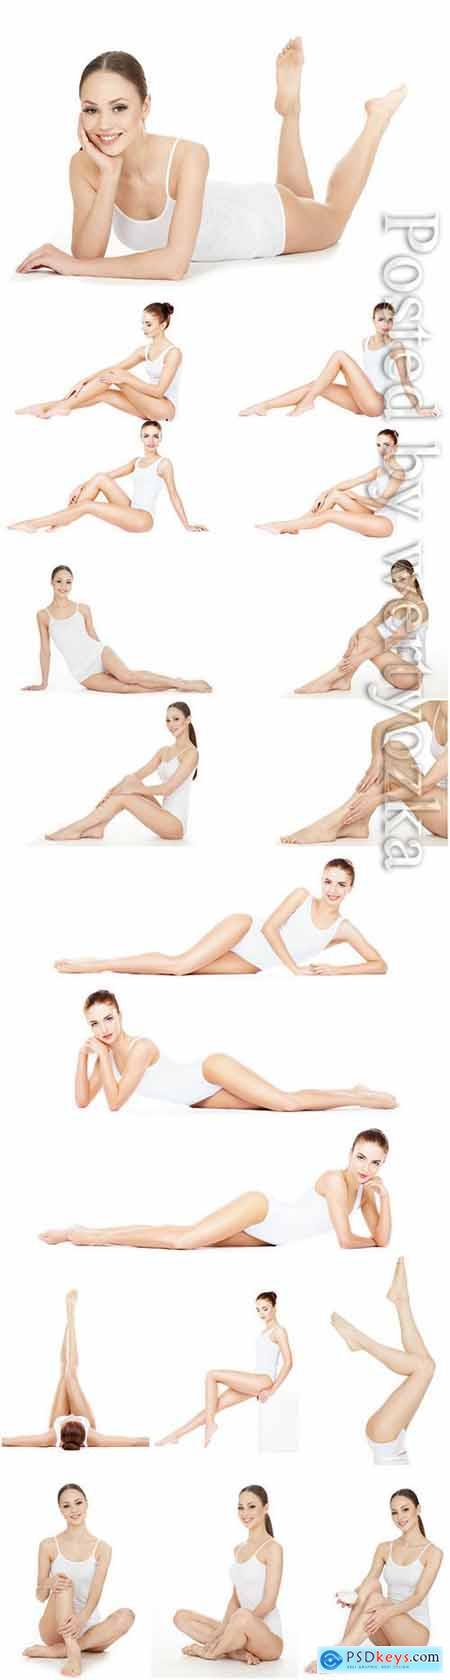 Girl in white bodysuit in different poses stock photo